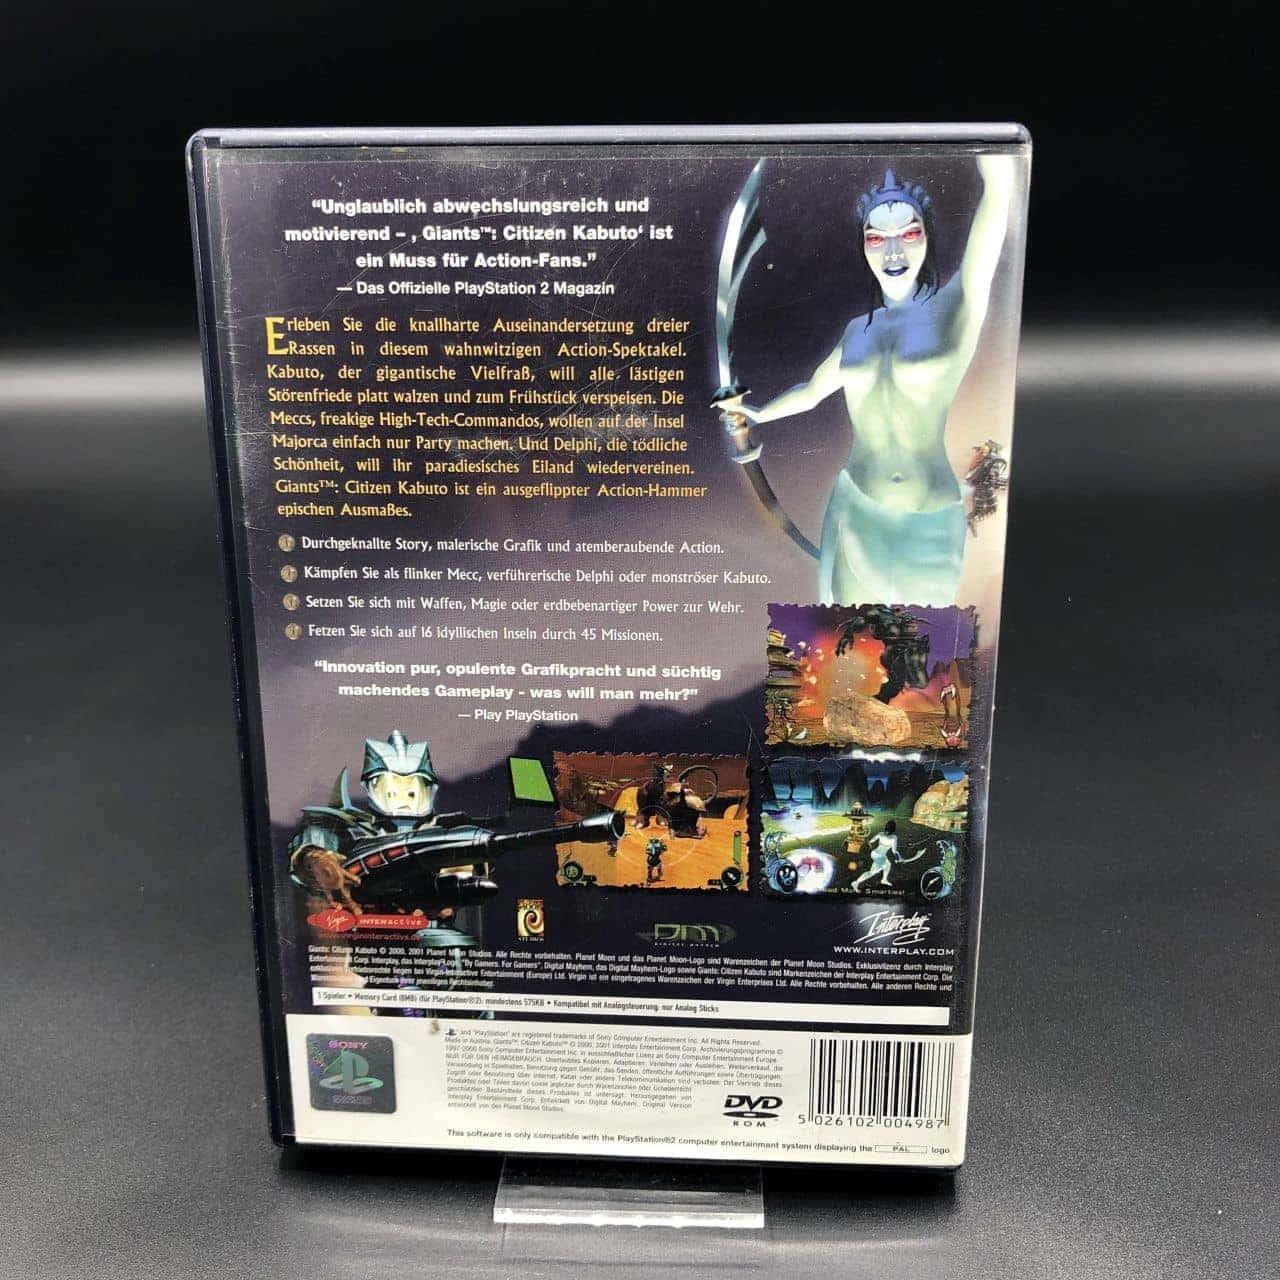 PS2 Giants: Citizen Kabuto (Komplett) (Gebrauchsspuren) Sony PlayStation 2